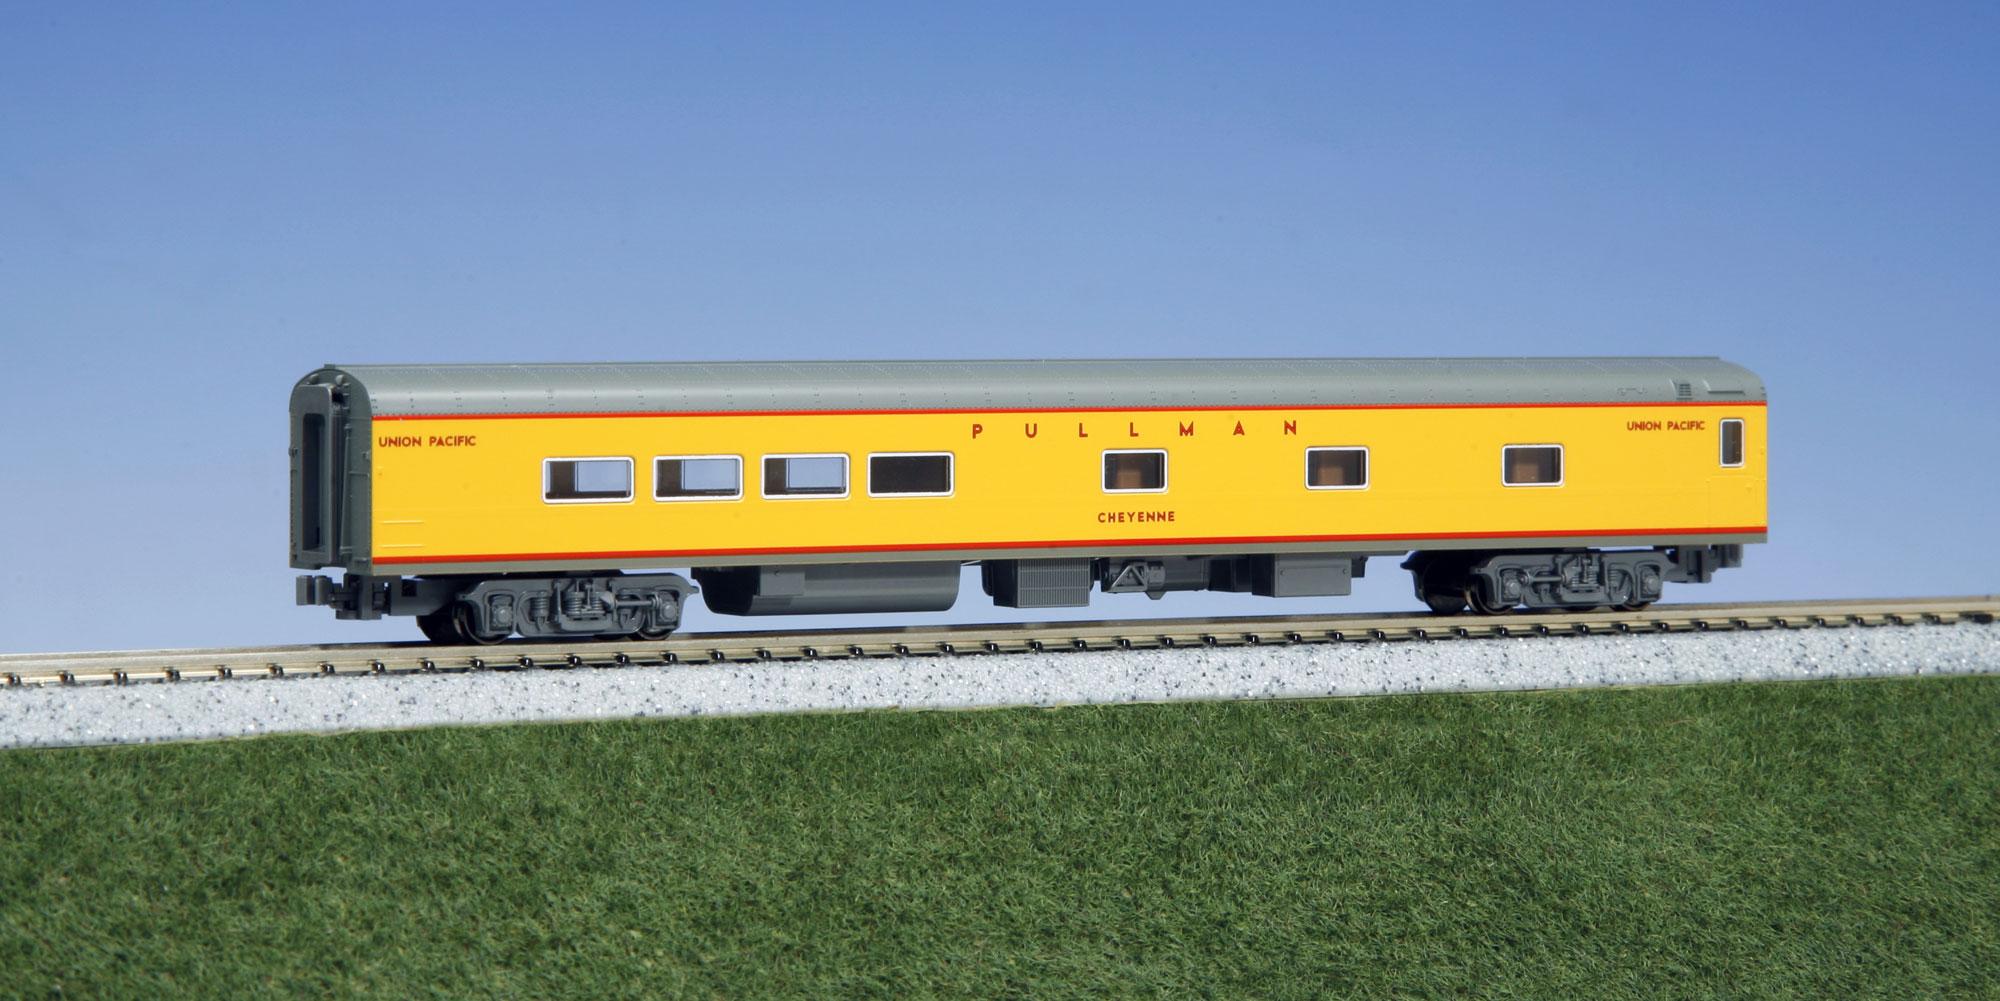 N Scale - Kato USA - 106-080-I - Passenger Car, Lightweight, ACF - Union Pacific - CHEYENNE